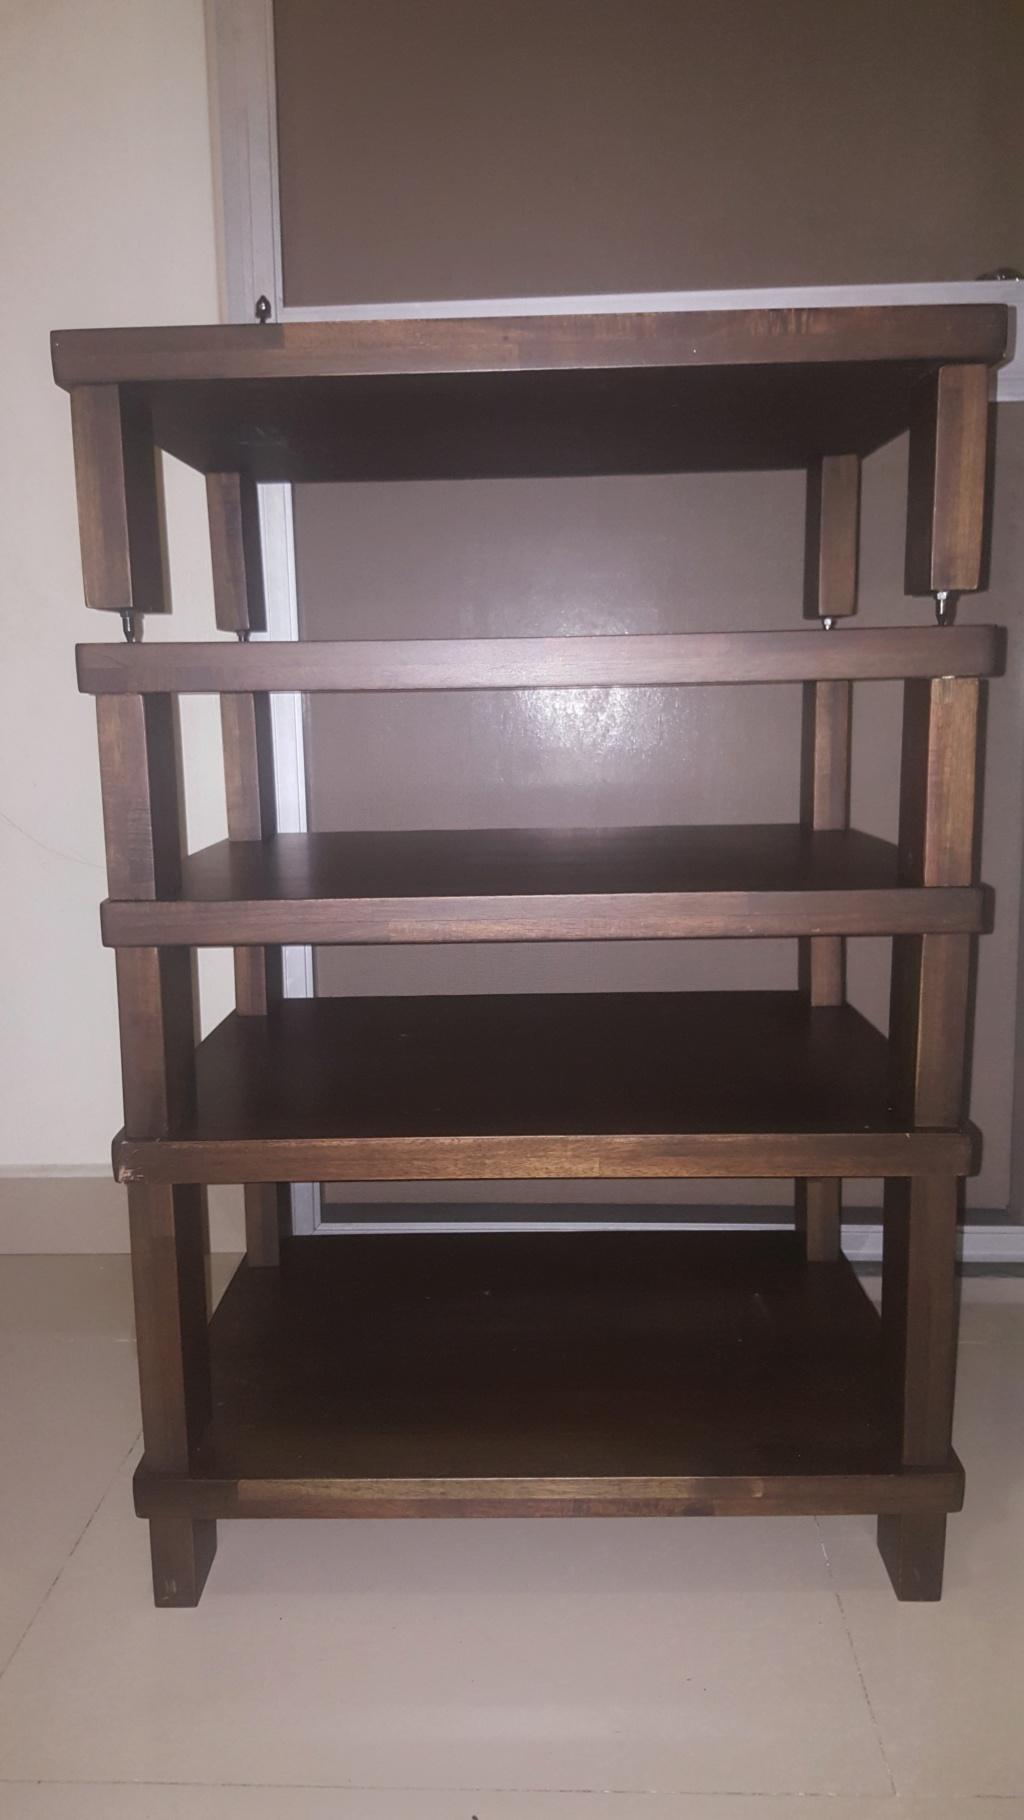 ATS 5 Tier Wooden Rack and Single Tier platform (Sold) 20190816